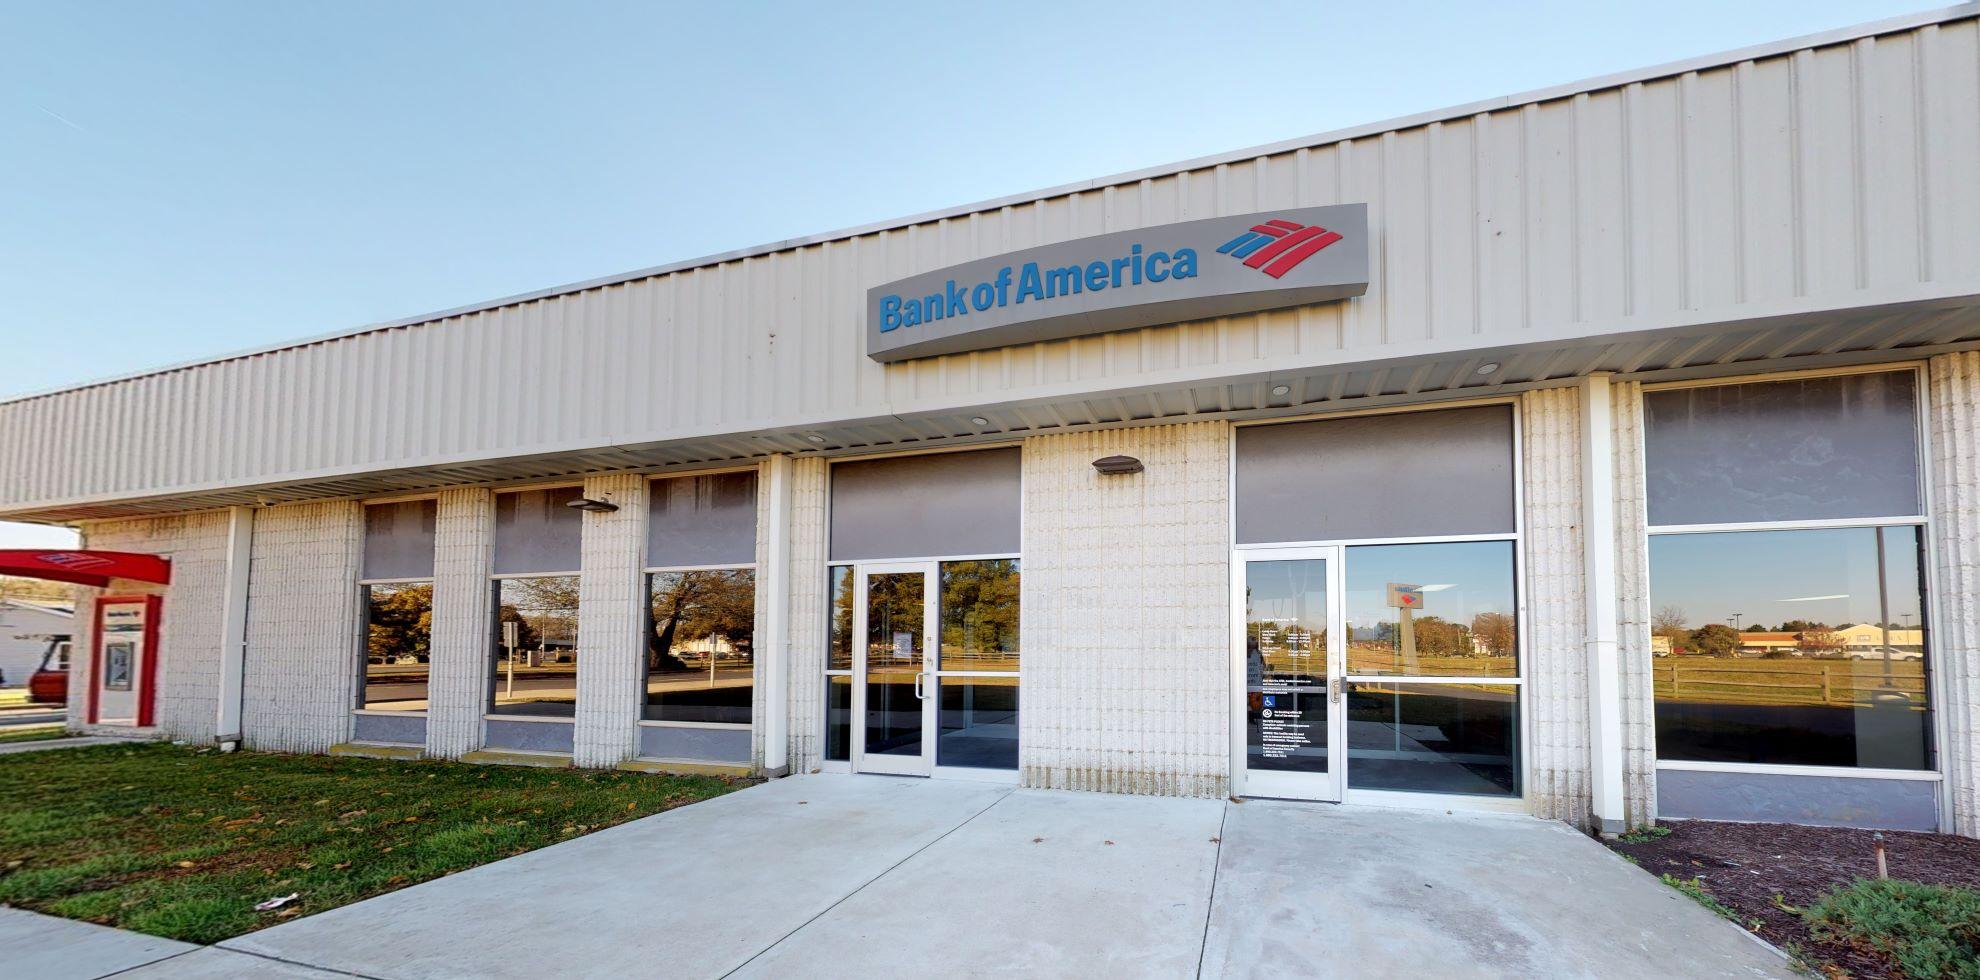 Bank of America financial center with drive-thru ATM   300 Tilghman Rd, Salisbury, MD 21804